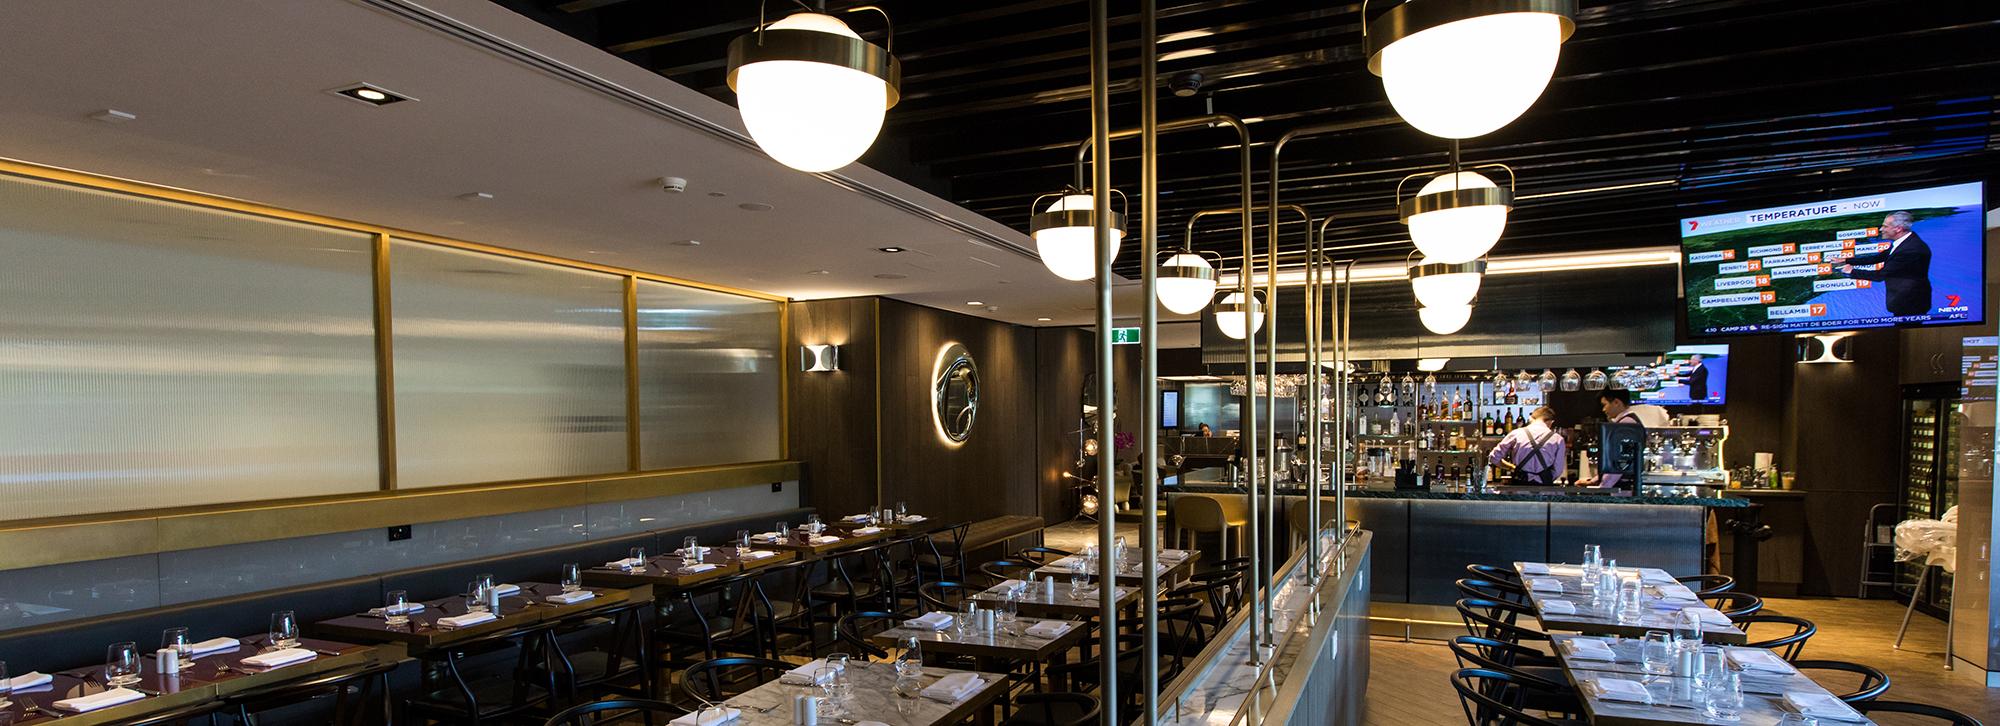 Nate's-Restaurant-and-Bar